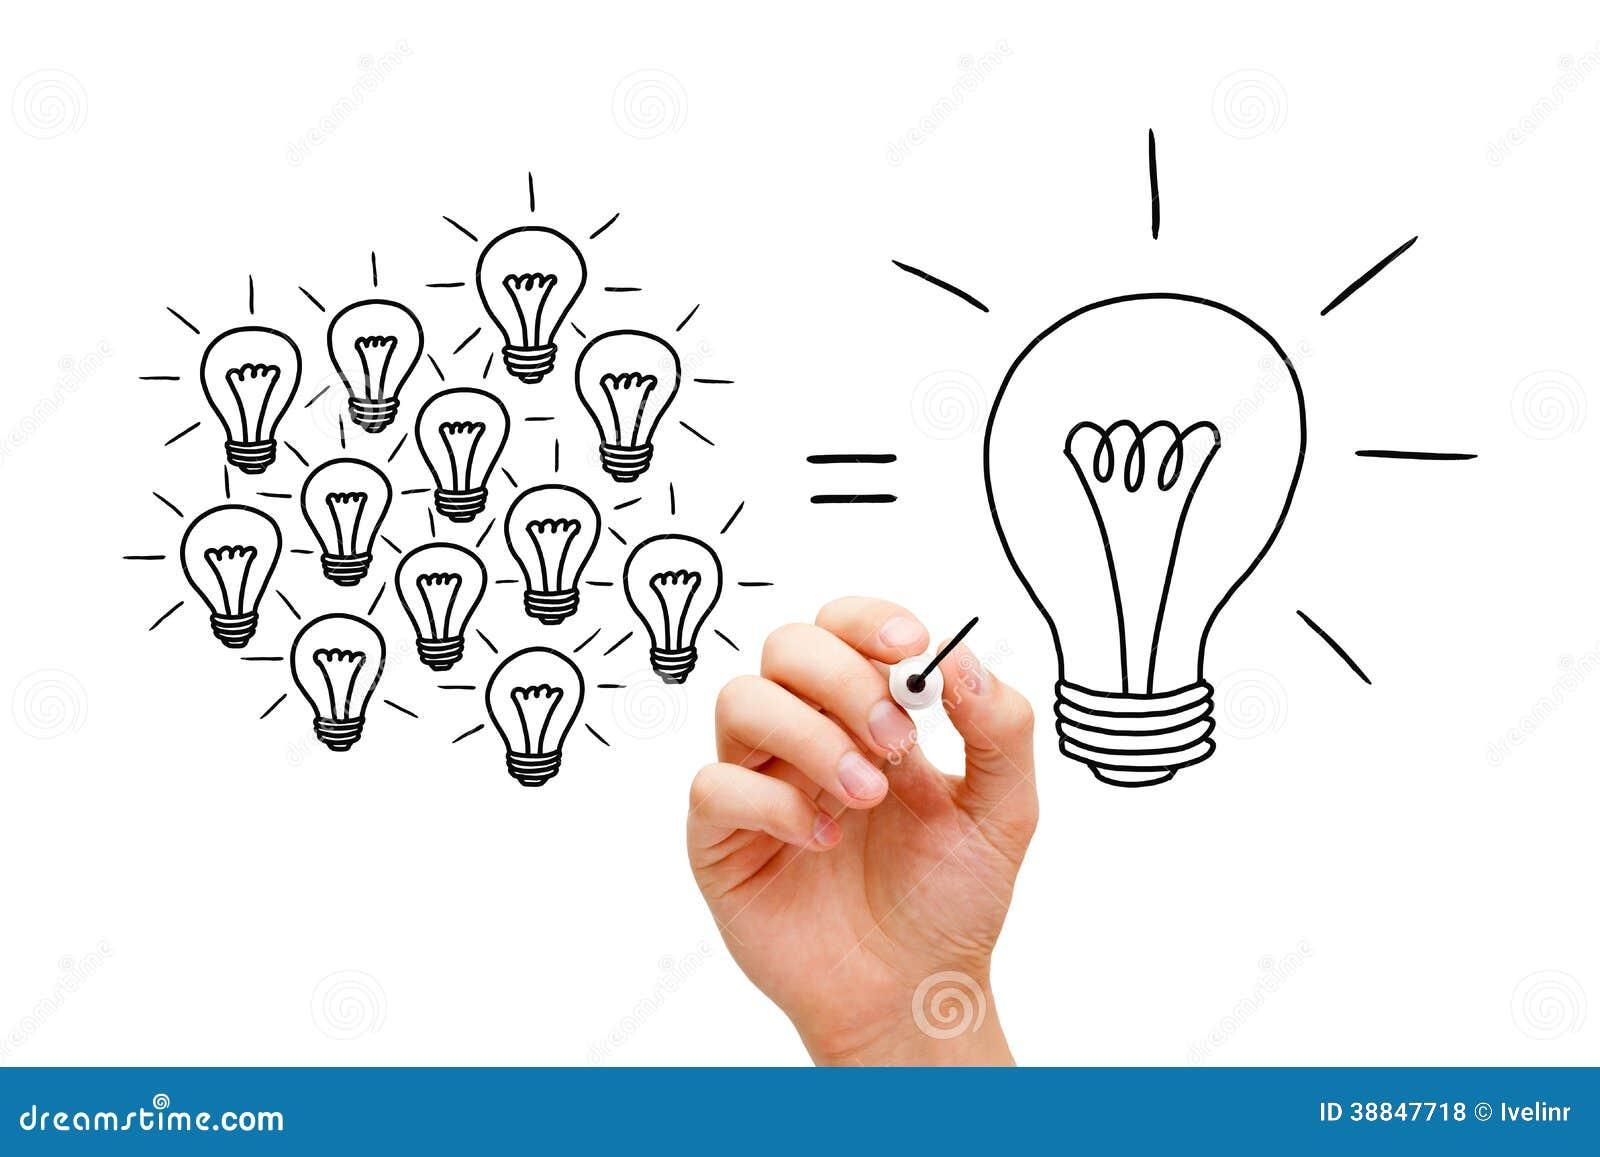 Teamwork-Glühlampe-Konzept